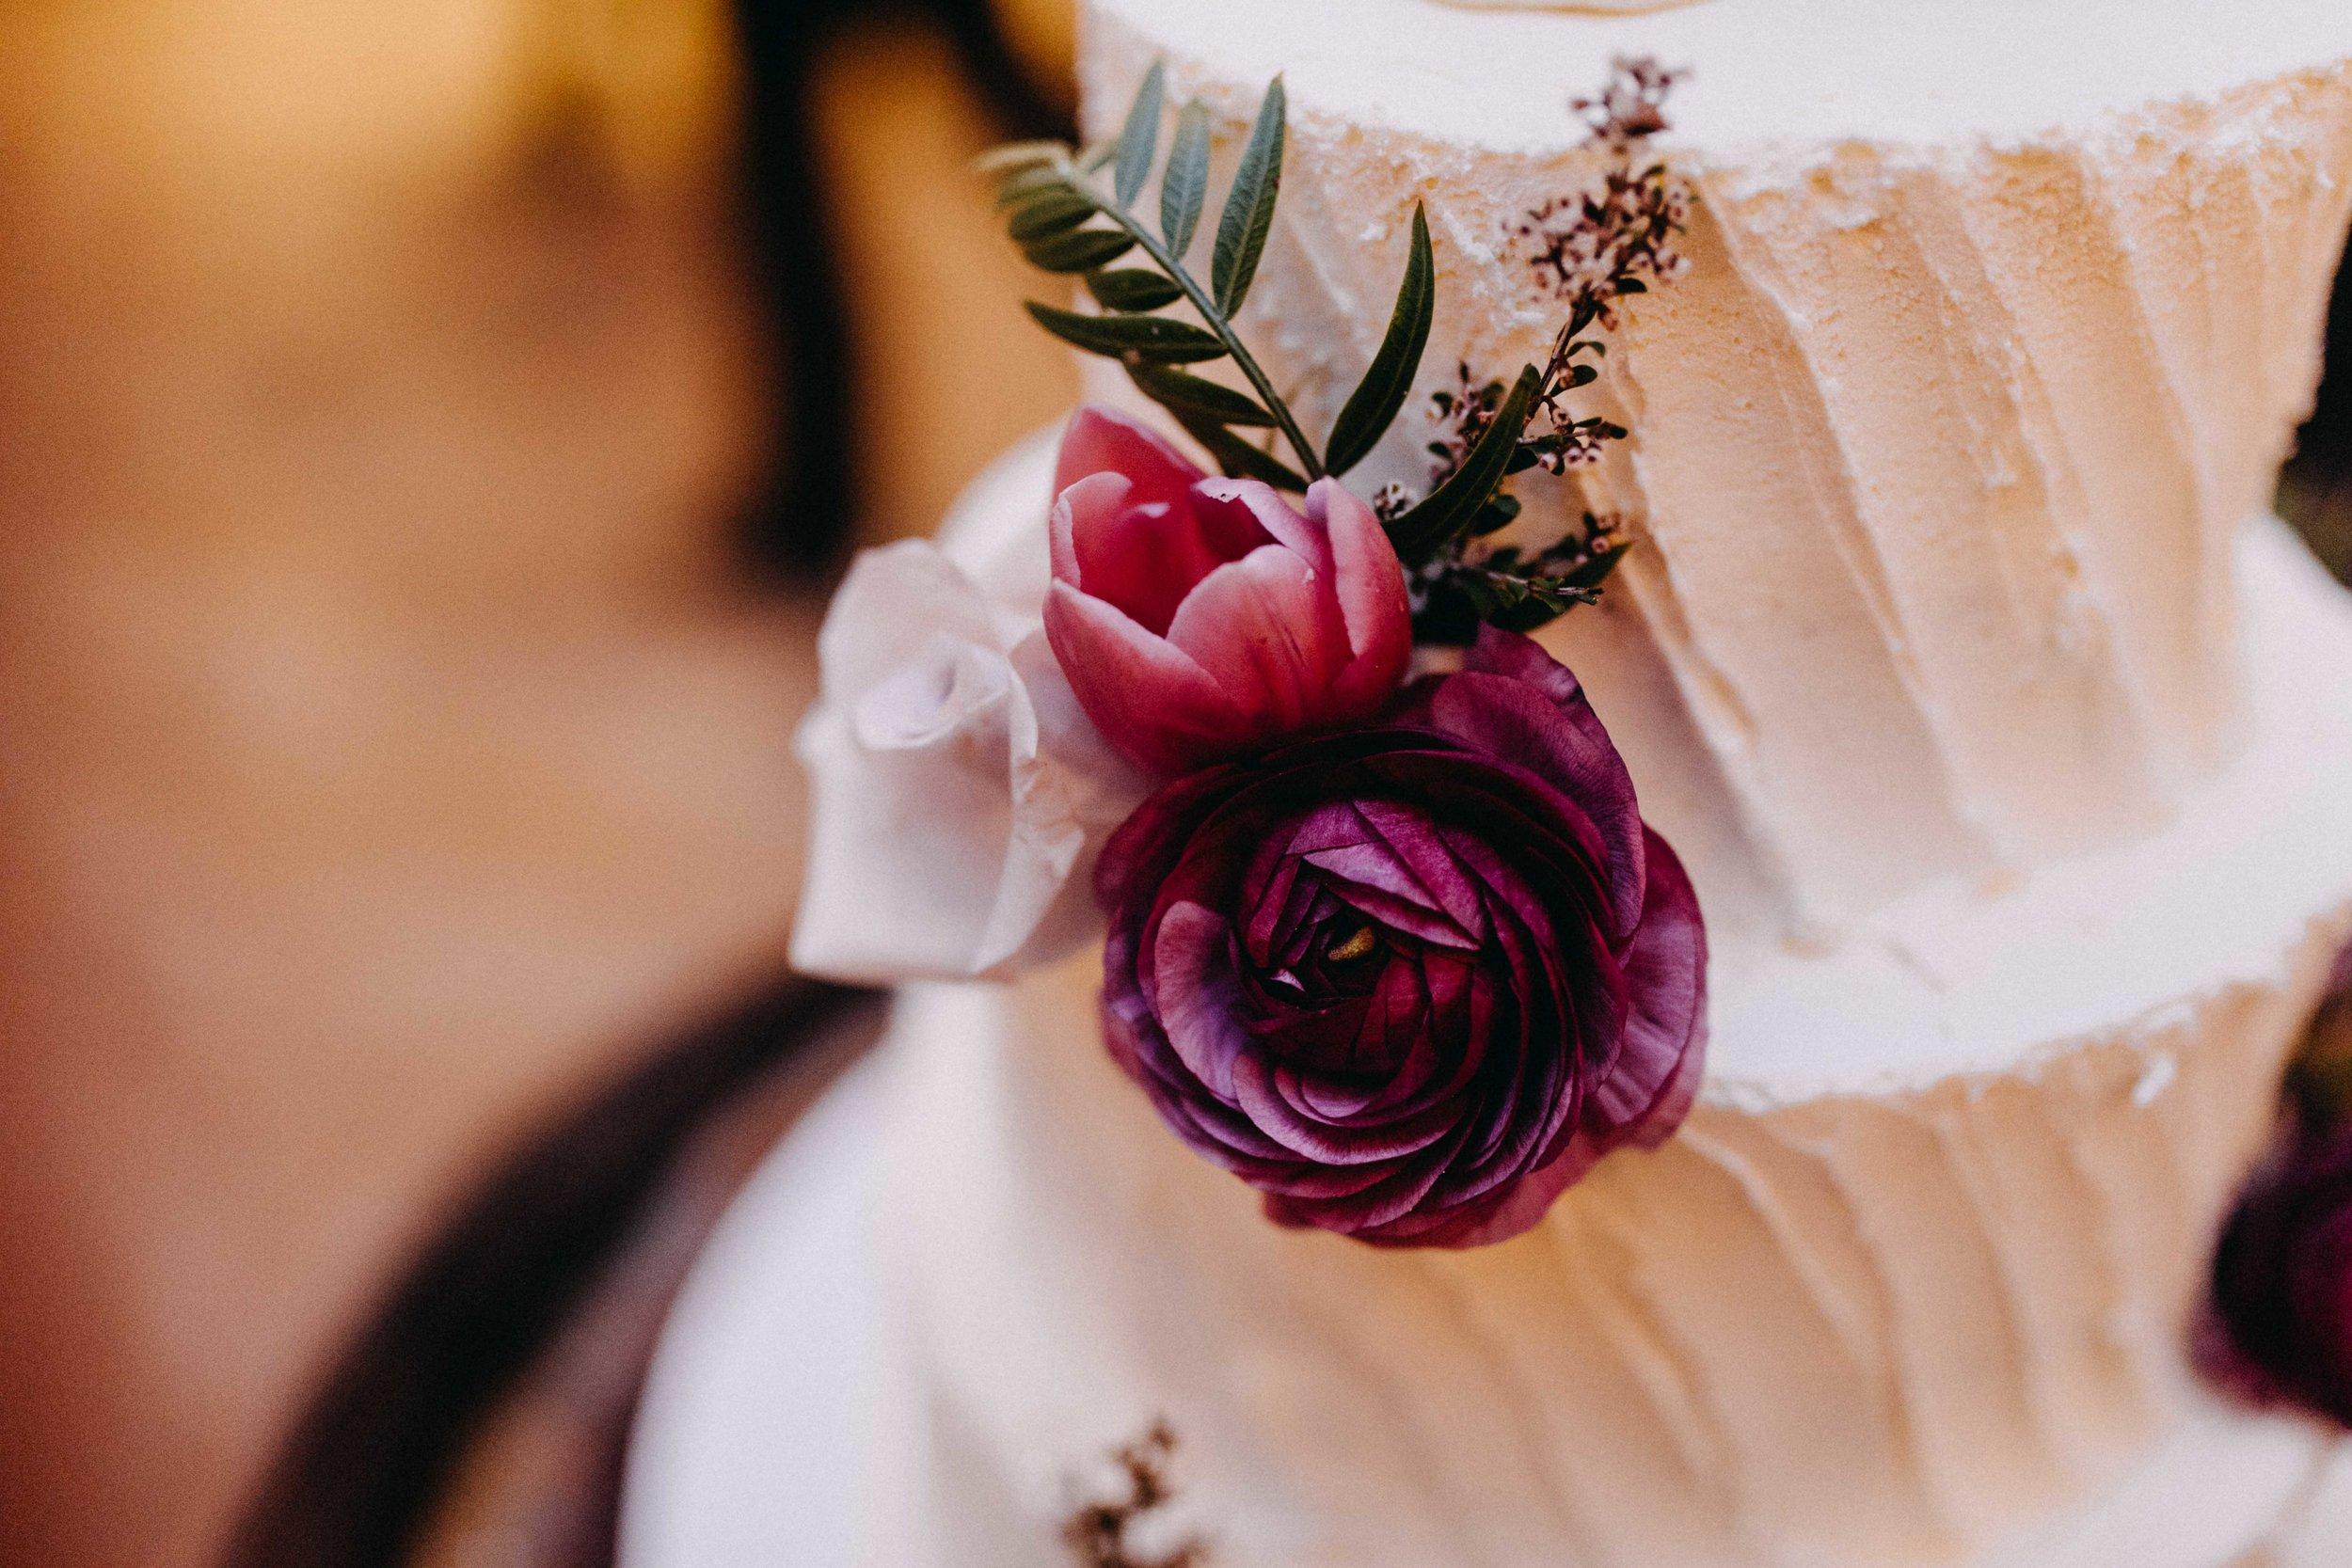 appin-house-wedding-macarthur-www.emilyobrienphotography.net-155.jpg